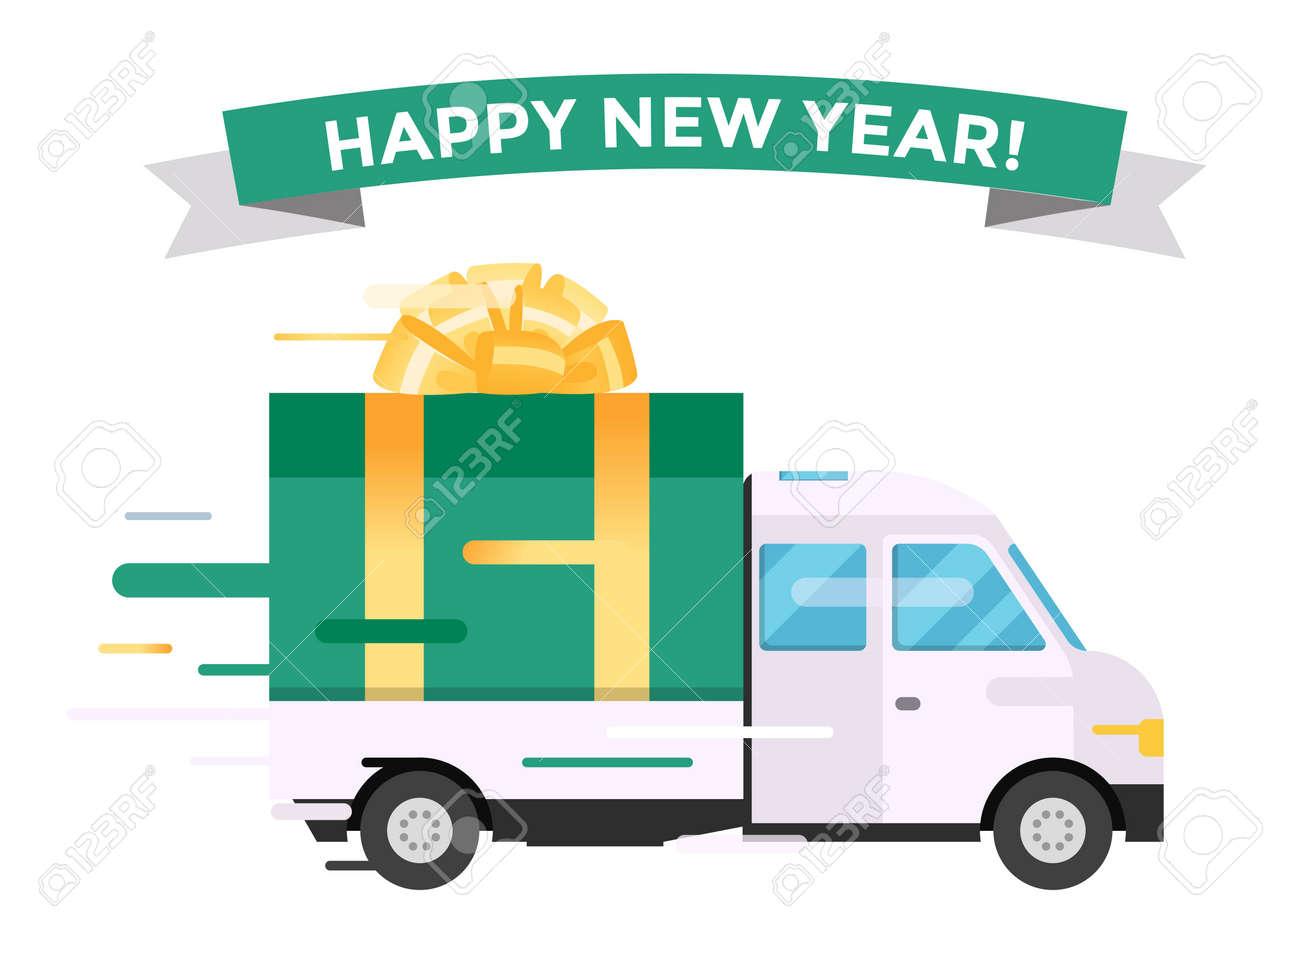 Delivery vector transport truck van christmas gift box bow ribbon delivery vector transport truck van christmas gift box bow ribbon delivery service van christmas greeting m4hsunfo